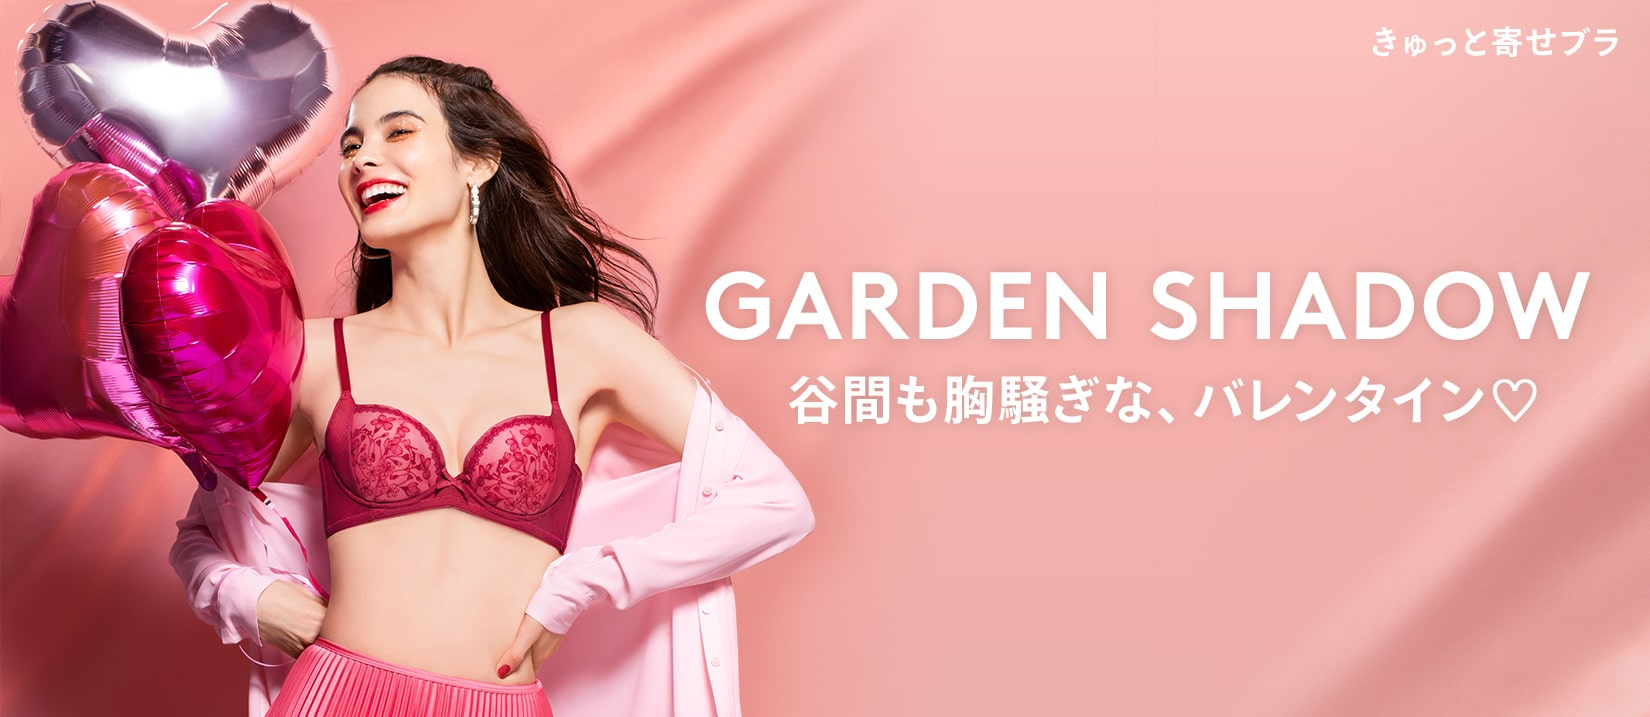 Garden Shadow(ガーデンシャドウ)